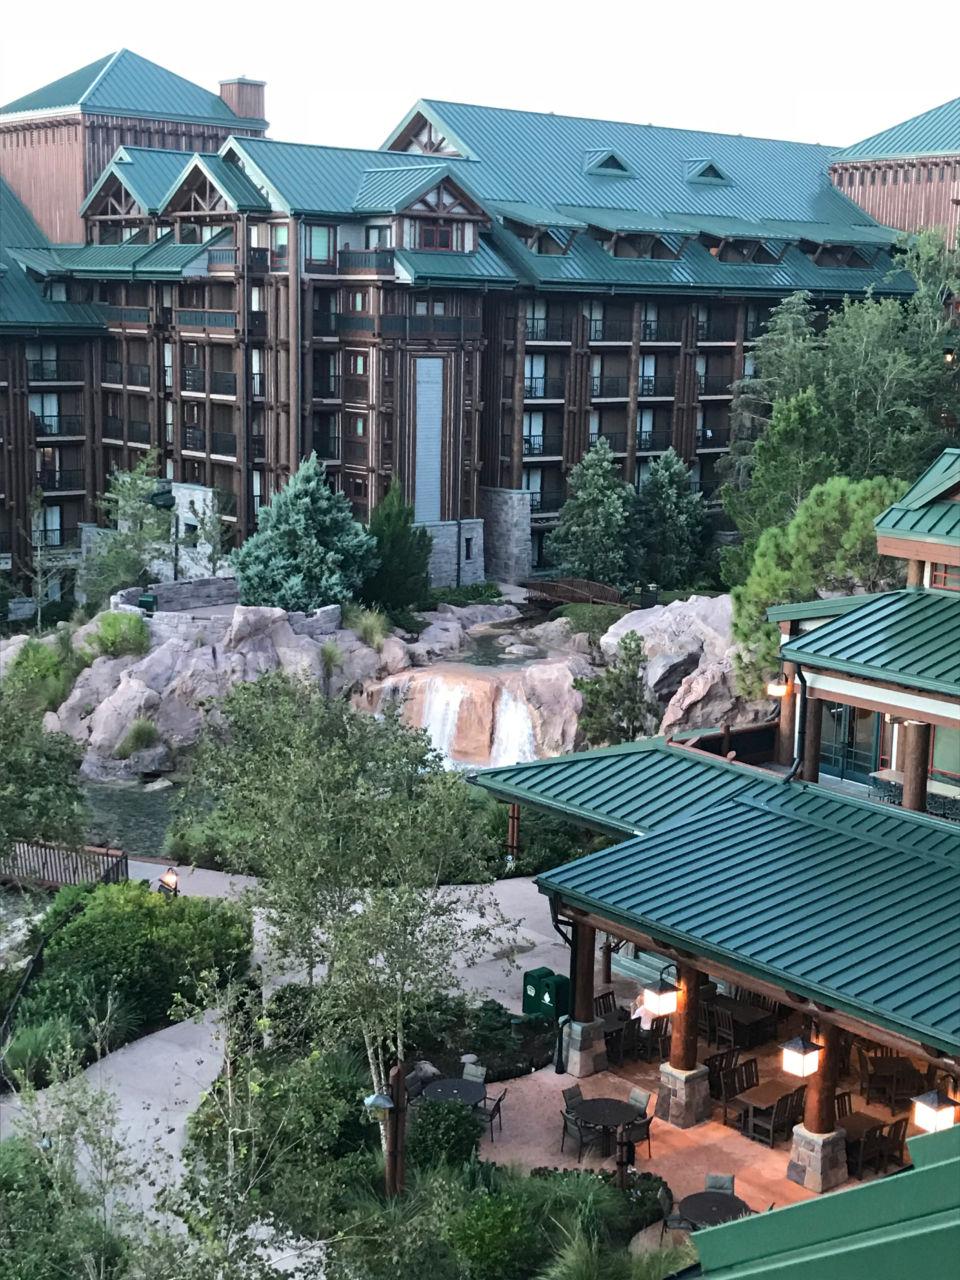 Wilderness Lodge 6th floor courtyard view room